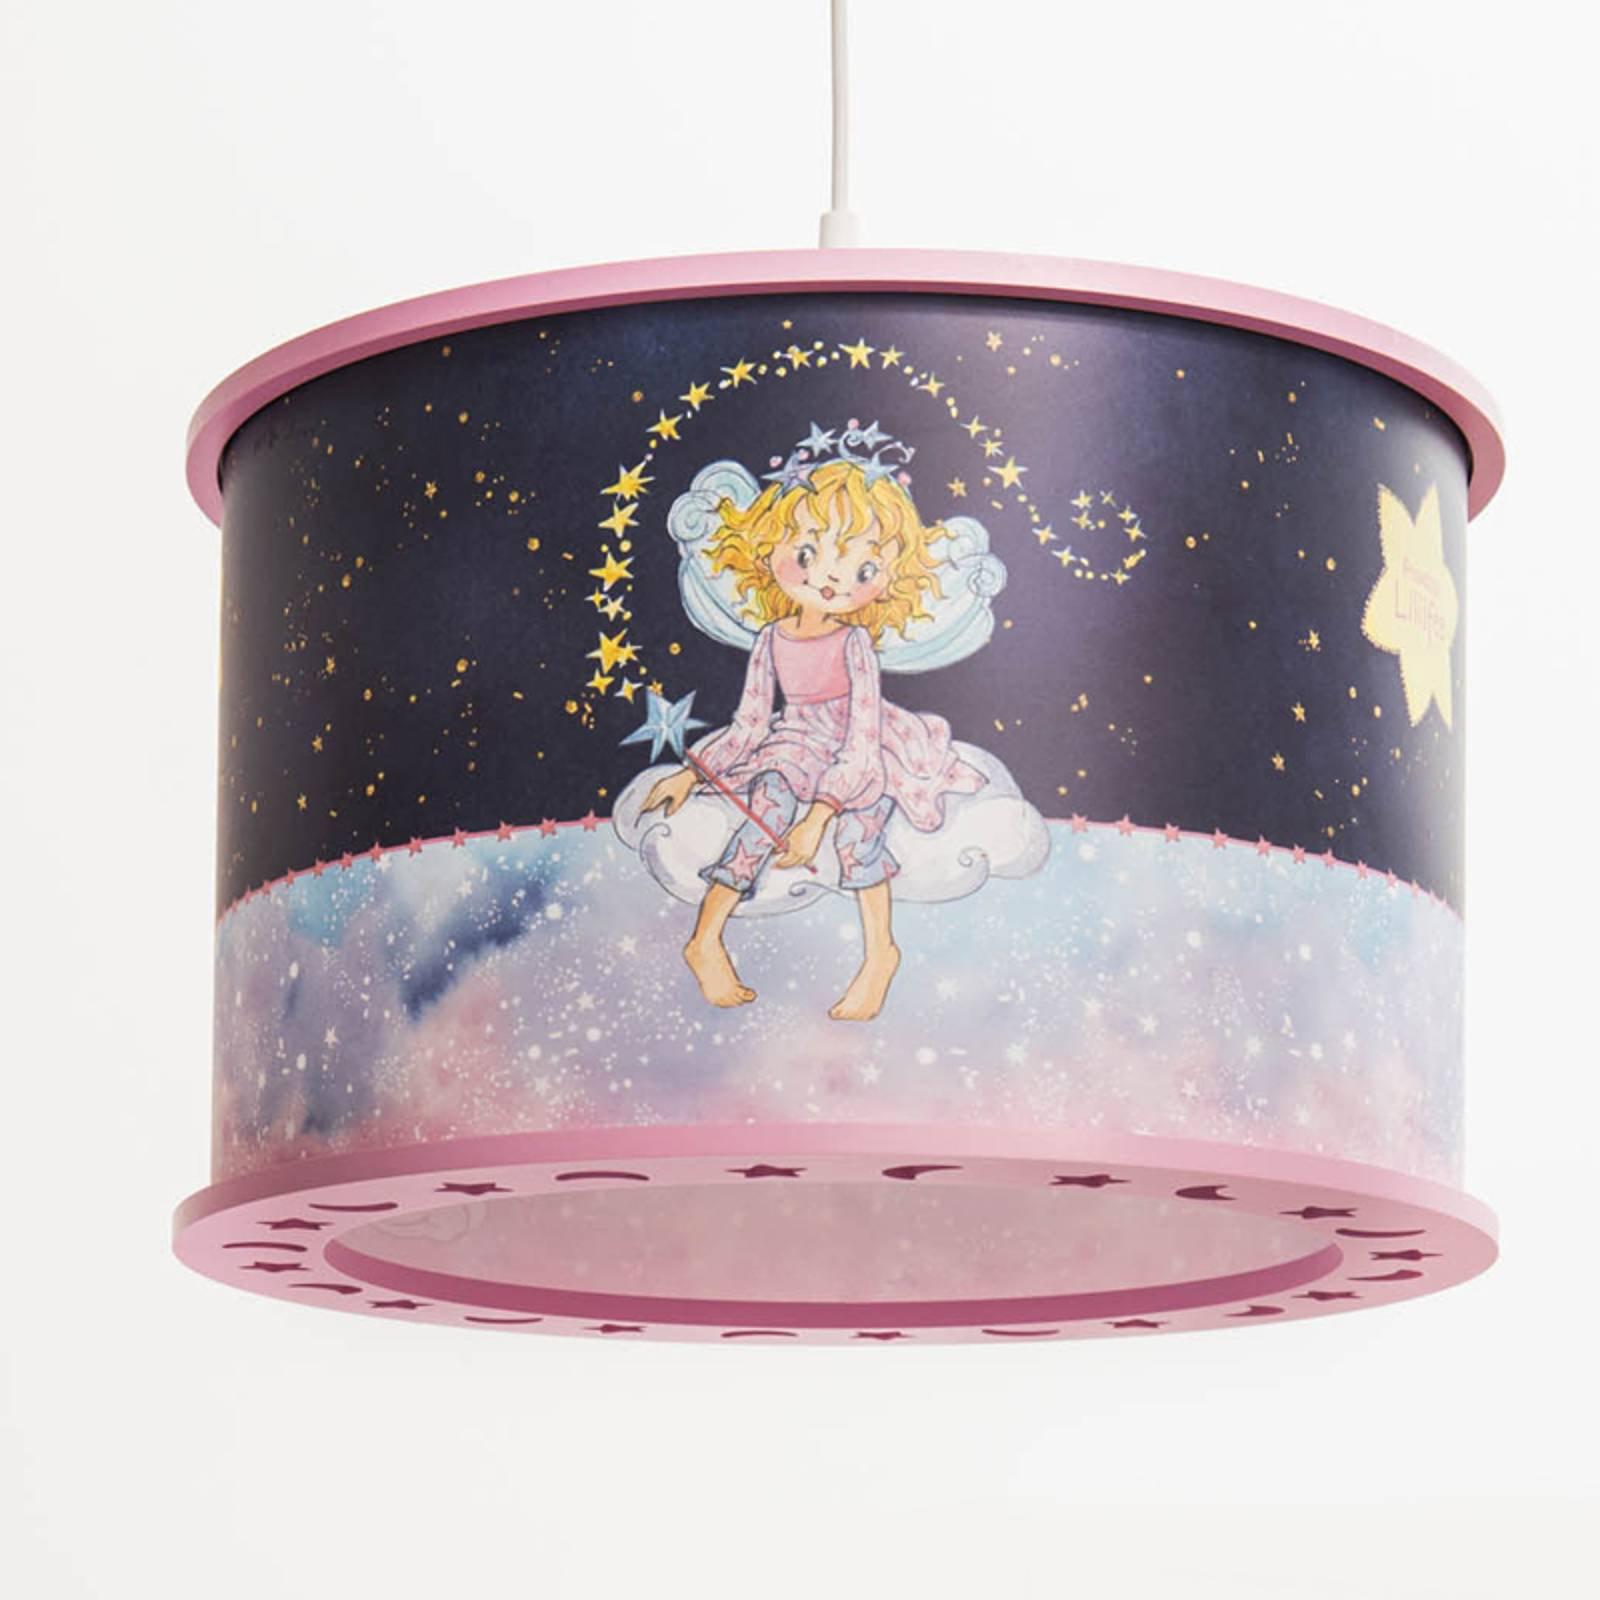 Hengelampe Prinsesse Lillifee, stjerner